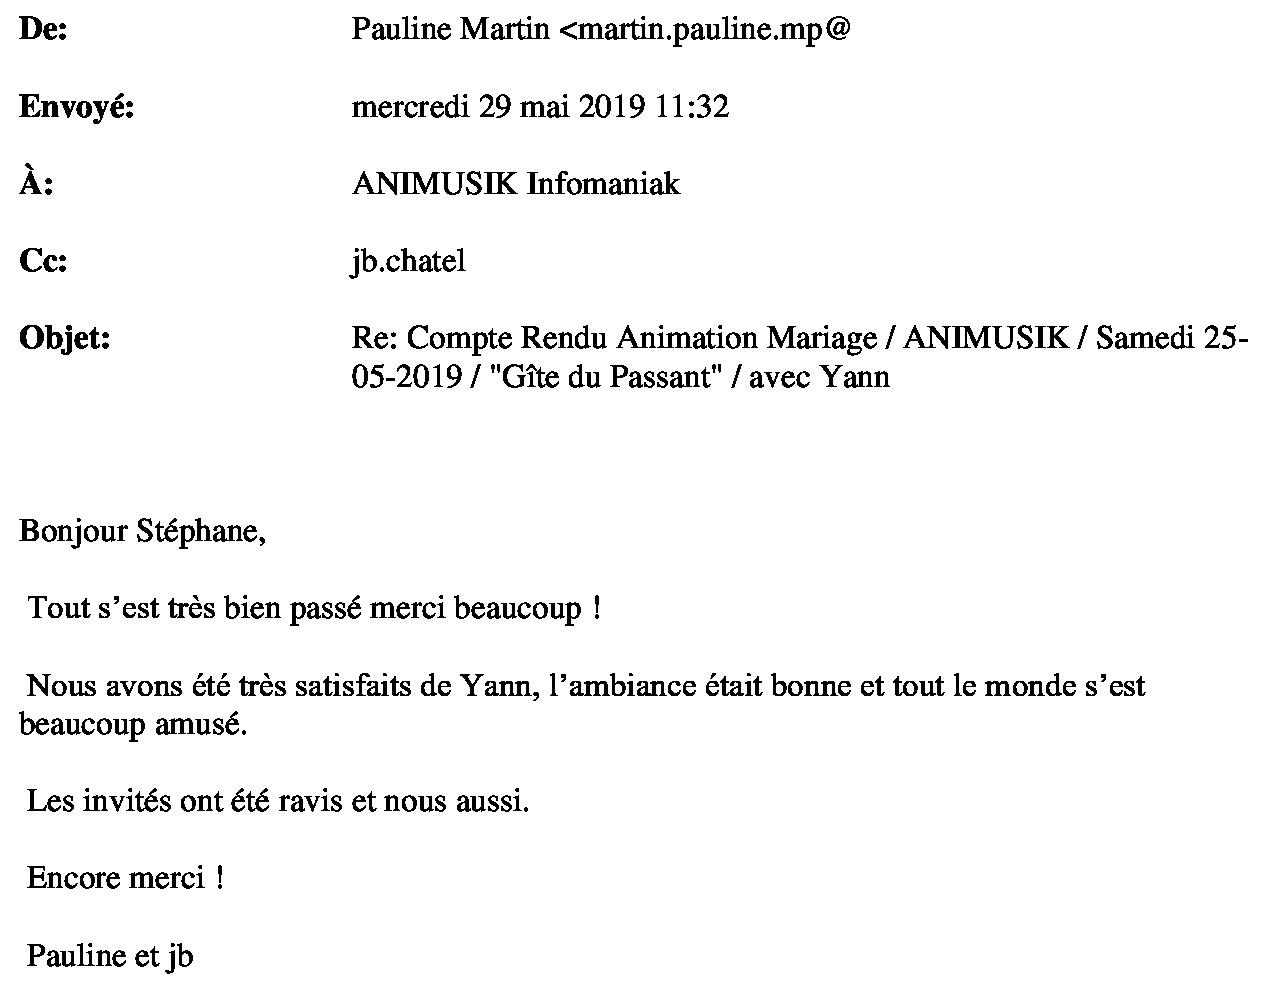 Mariage-CHATEL-Jean-Baptiste-_-MARTIN-Pa